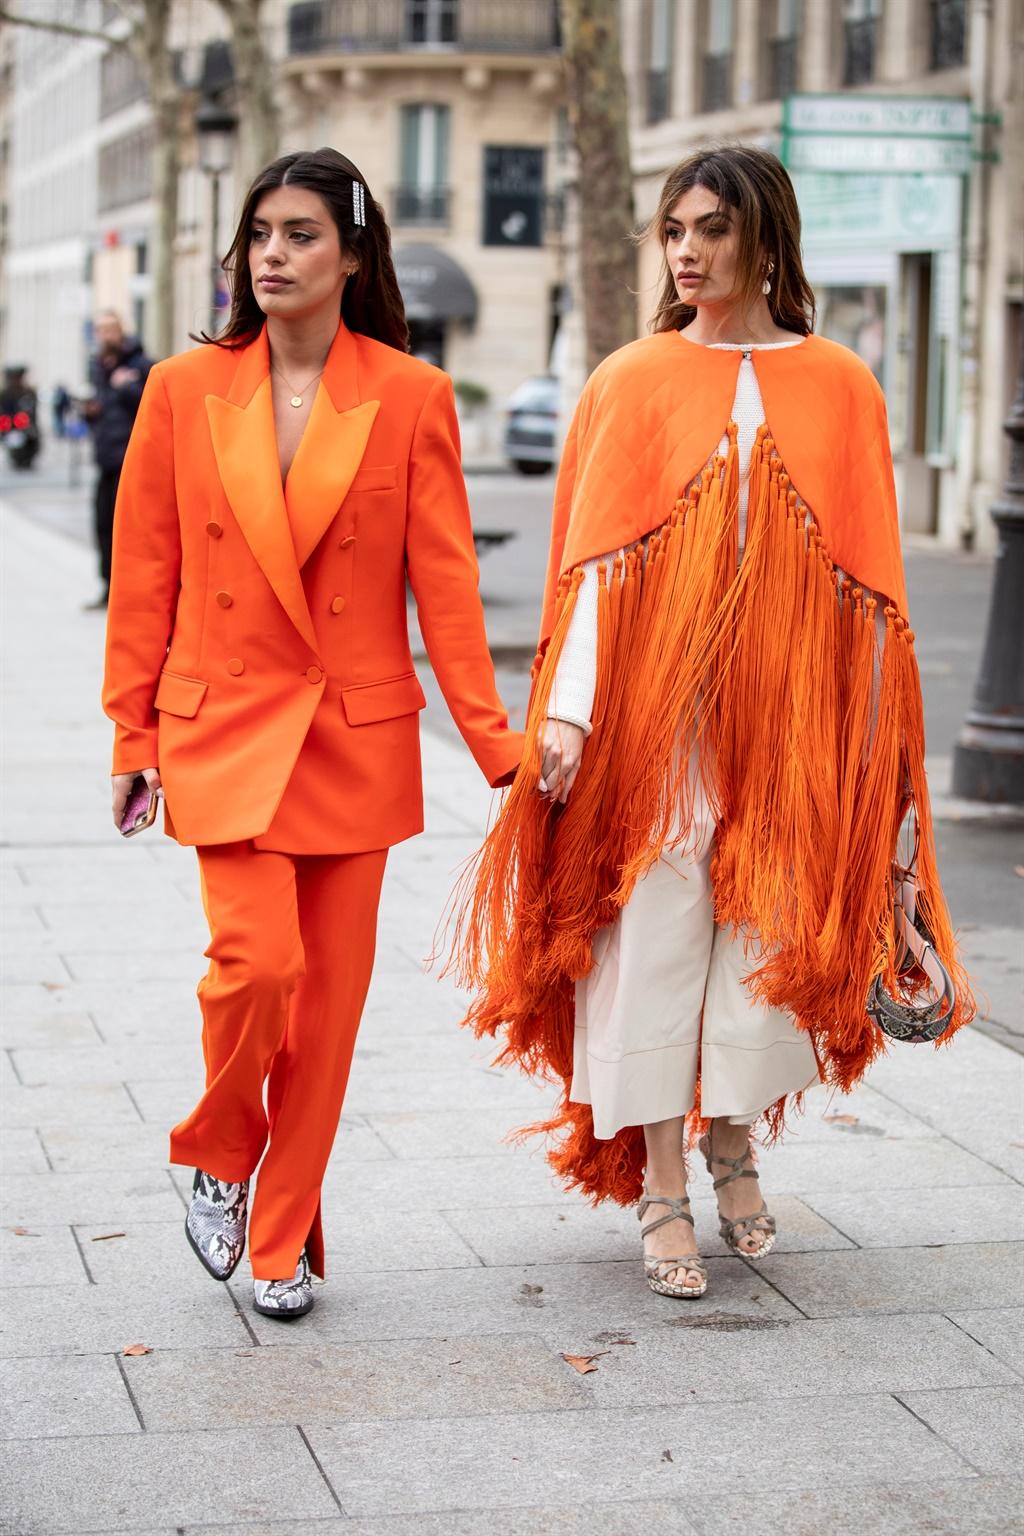 PARIS, FRANCE - MARCH 02: Aida Domenech, wearing a